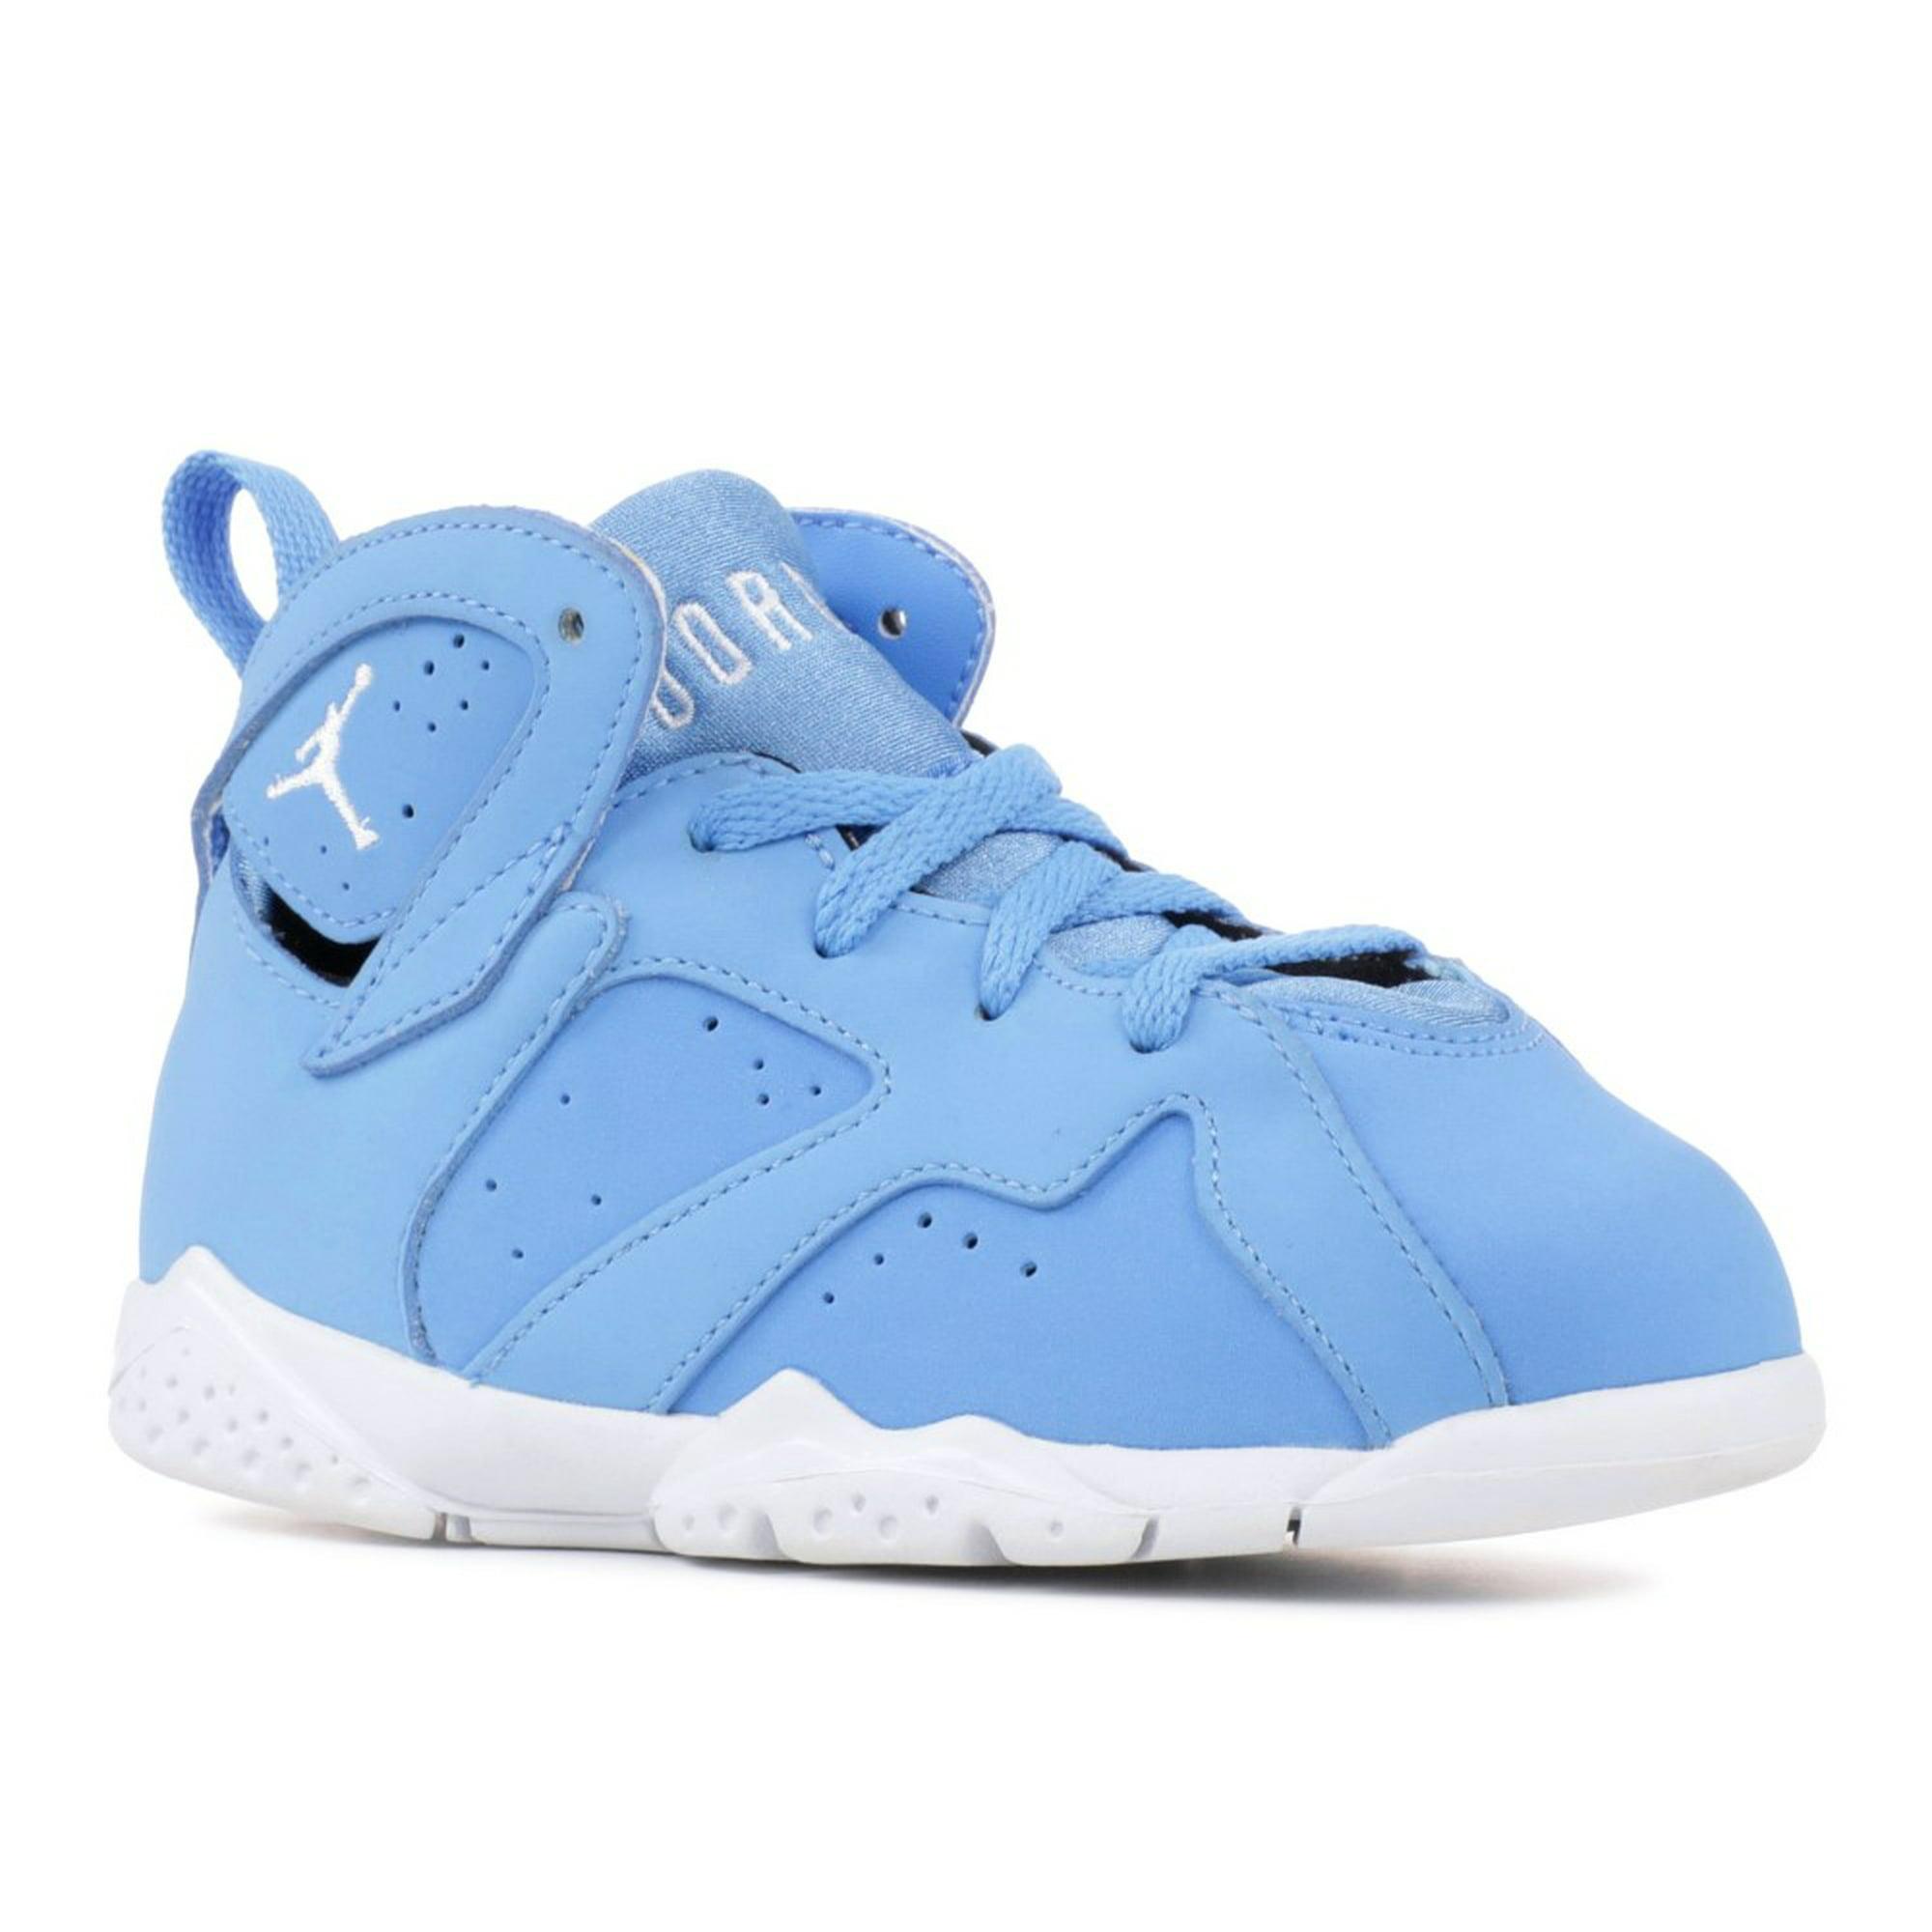 size 40 5f928 be45c Jordan 7 Retro Bt (Td) 'Pantone' - 304772-400 - Size 9 ...